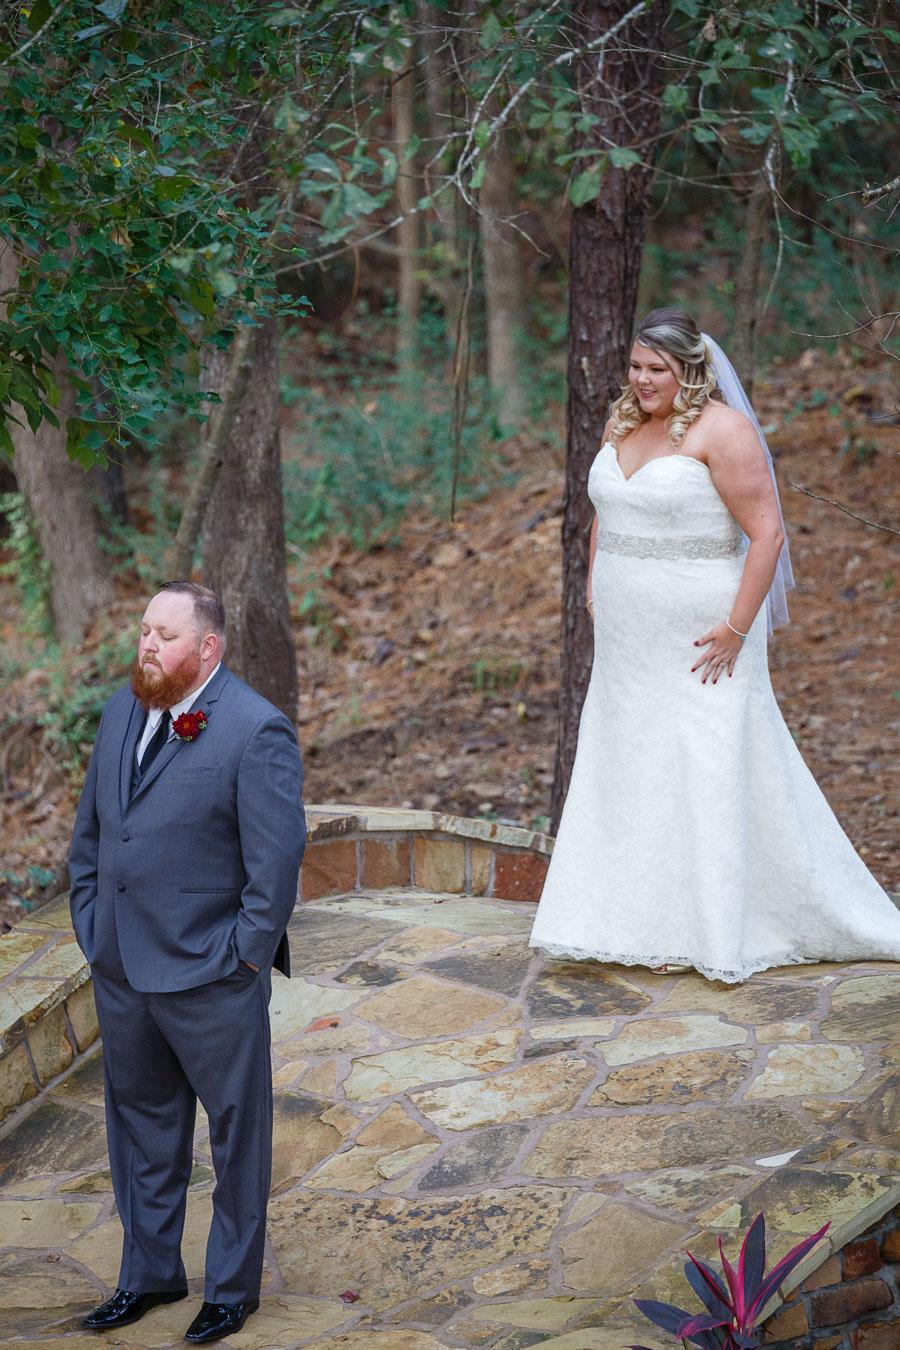 REAL WEDDING | RUSTIC GLAM TEXAS WEDDING | C.Baron Photography | Pretty Pear Bride